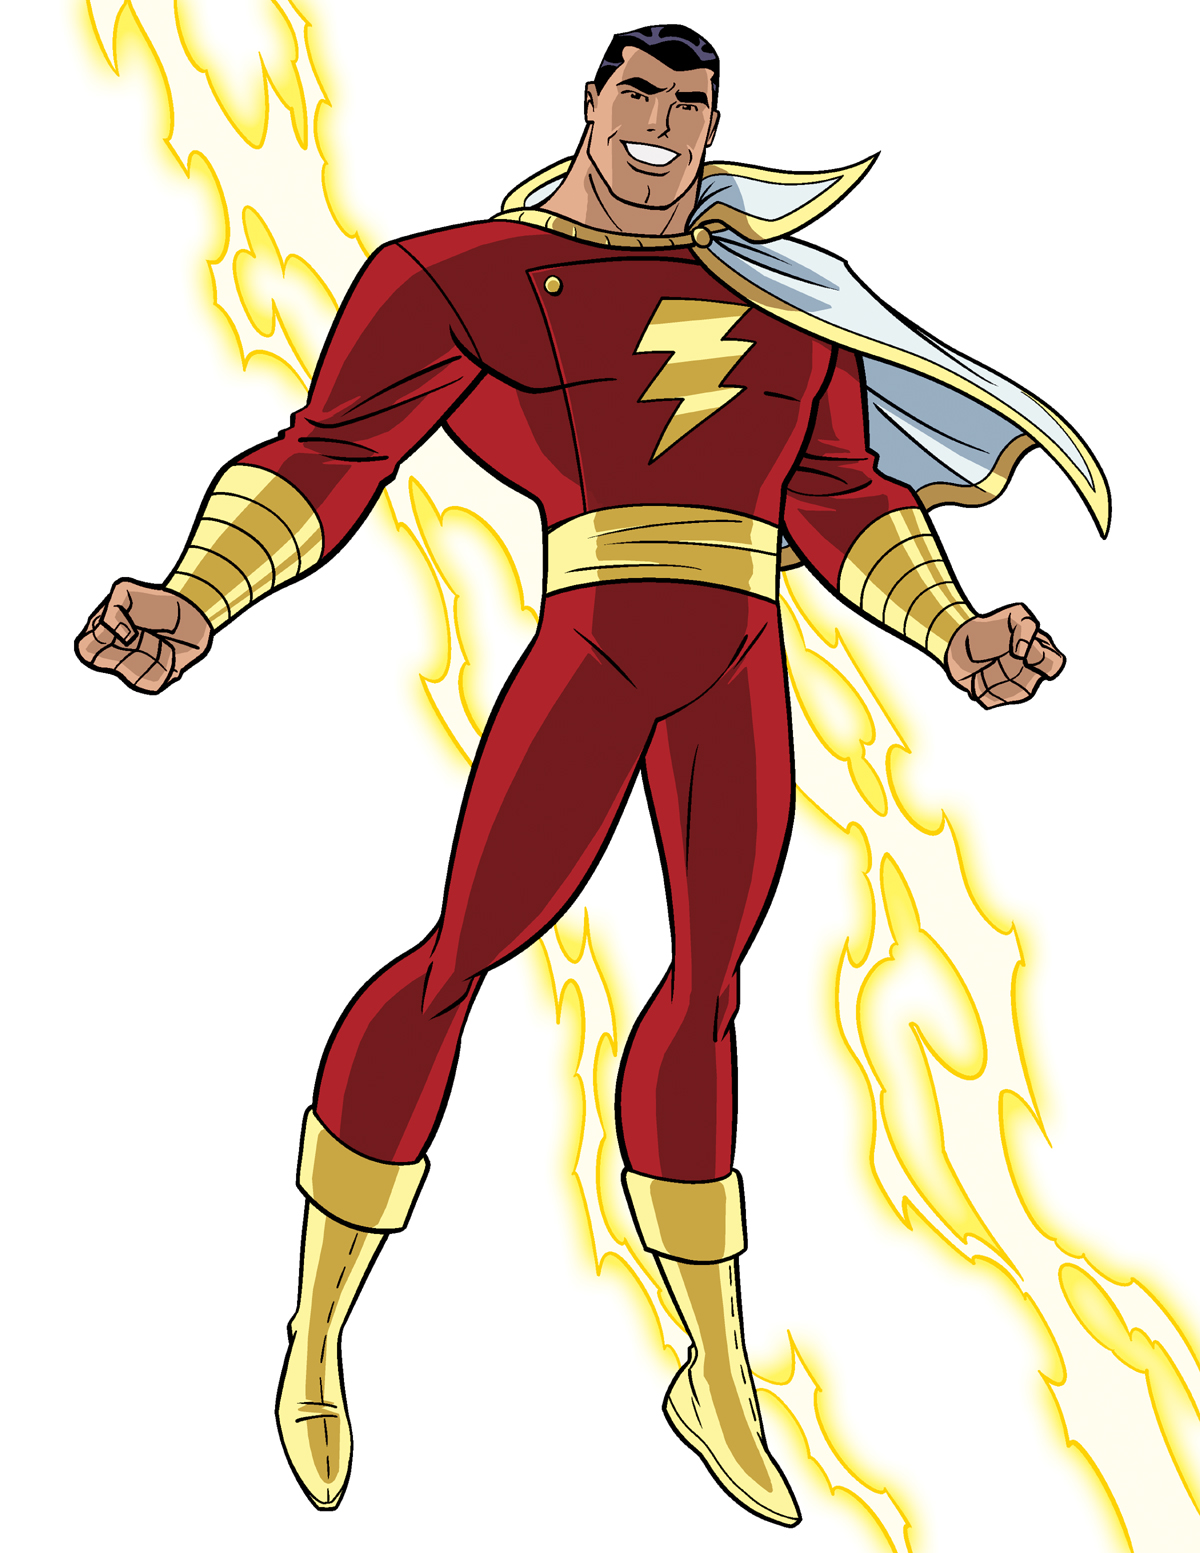 how to draw dc heroes - captain marvel/shazamtimlevins on deviantart